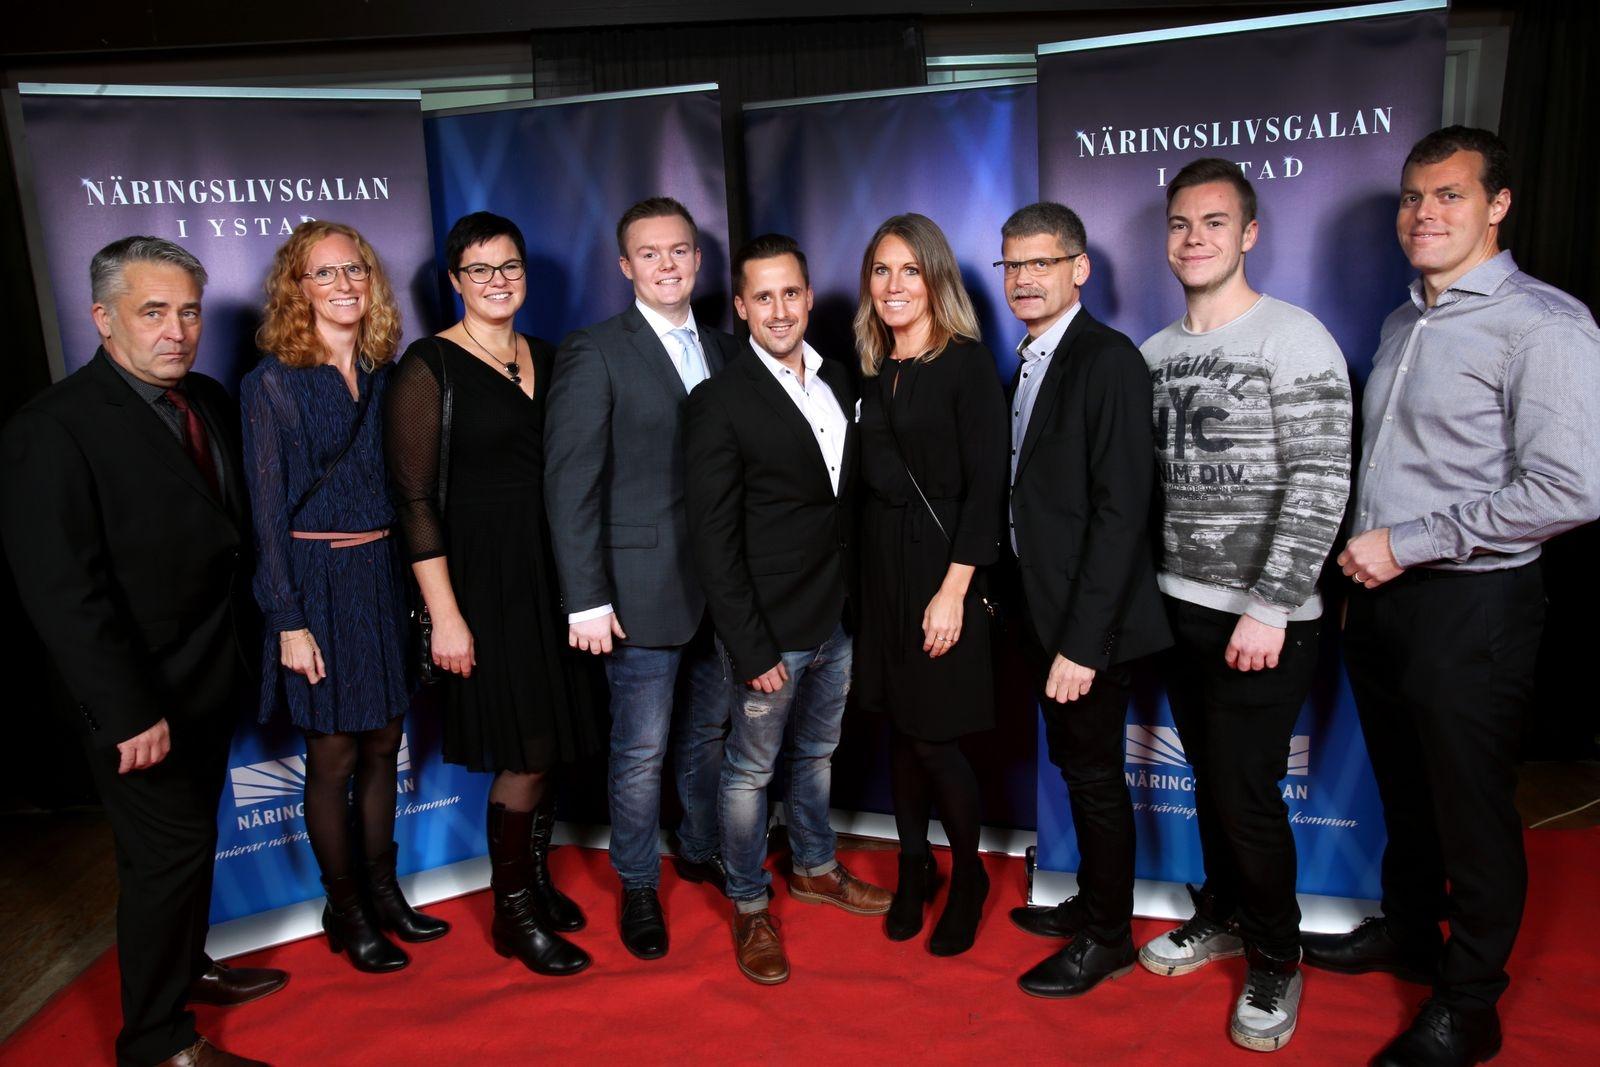 Leif Svensson, Sara Börjesson, Anna Olsson, Linus Danrup, Marcus Malmros, Susanne Göransson, Anders Lindé, Philip Sköld och Stefan Olsson, Gebo snickerier